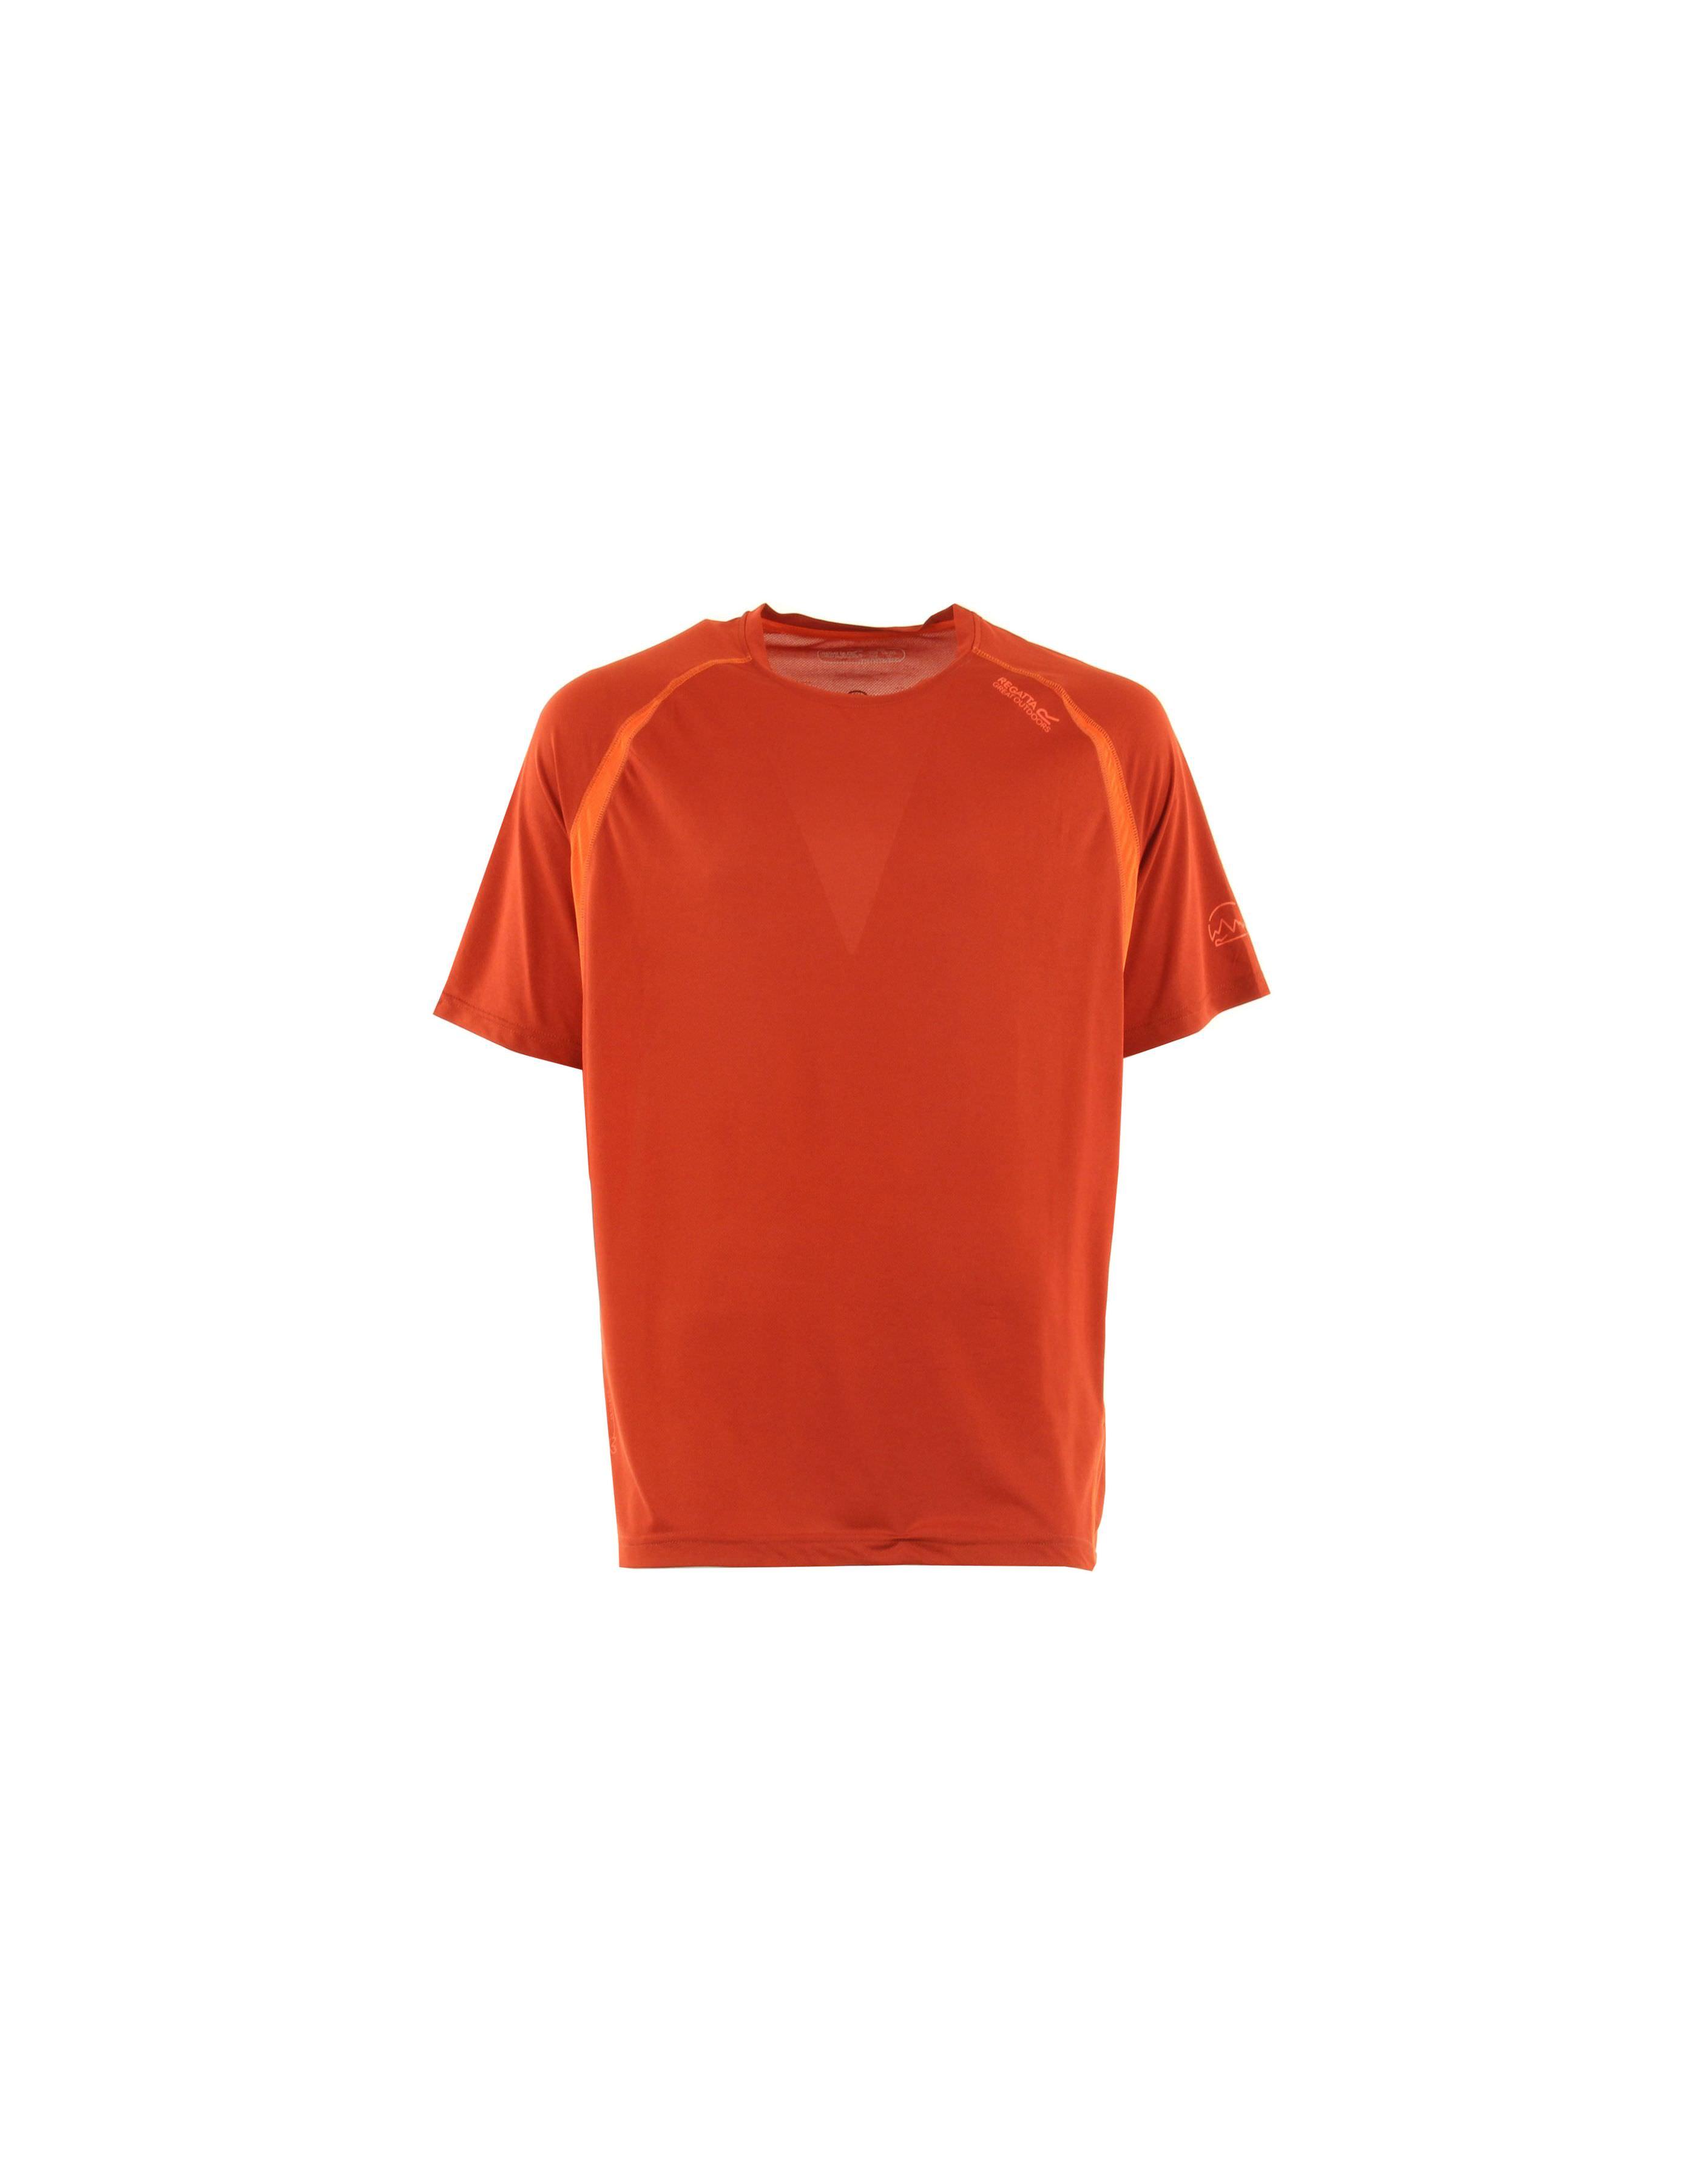 T shirt VOLITO